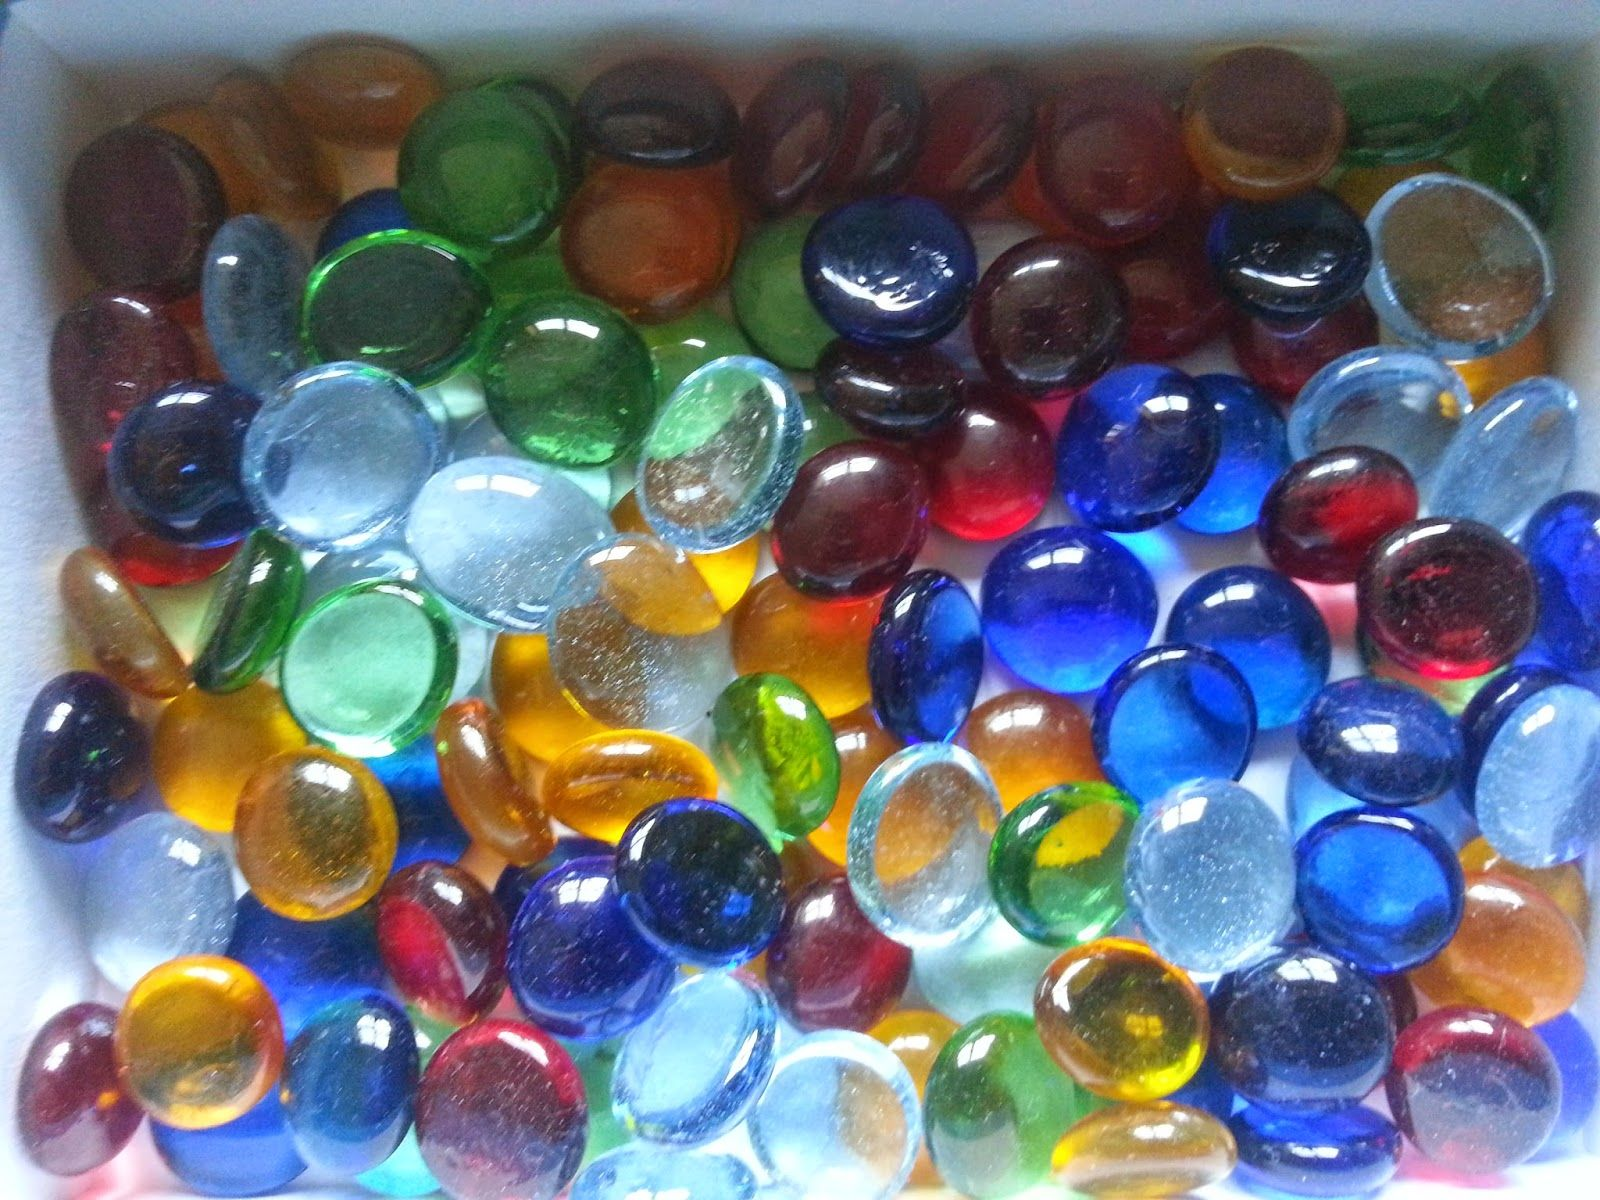 Klassenzauber: Muggelsteine - Verwendung in der Schule